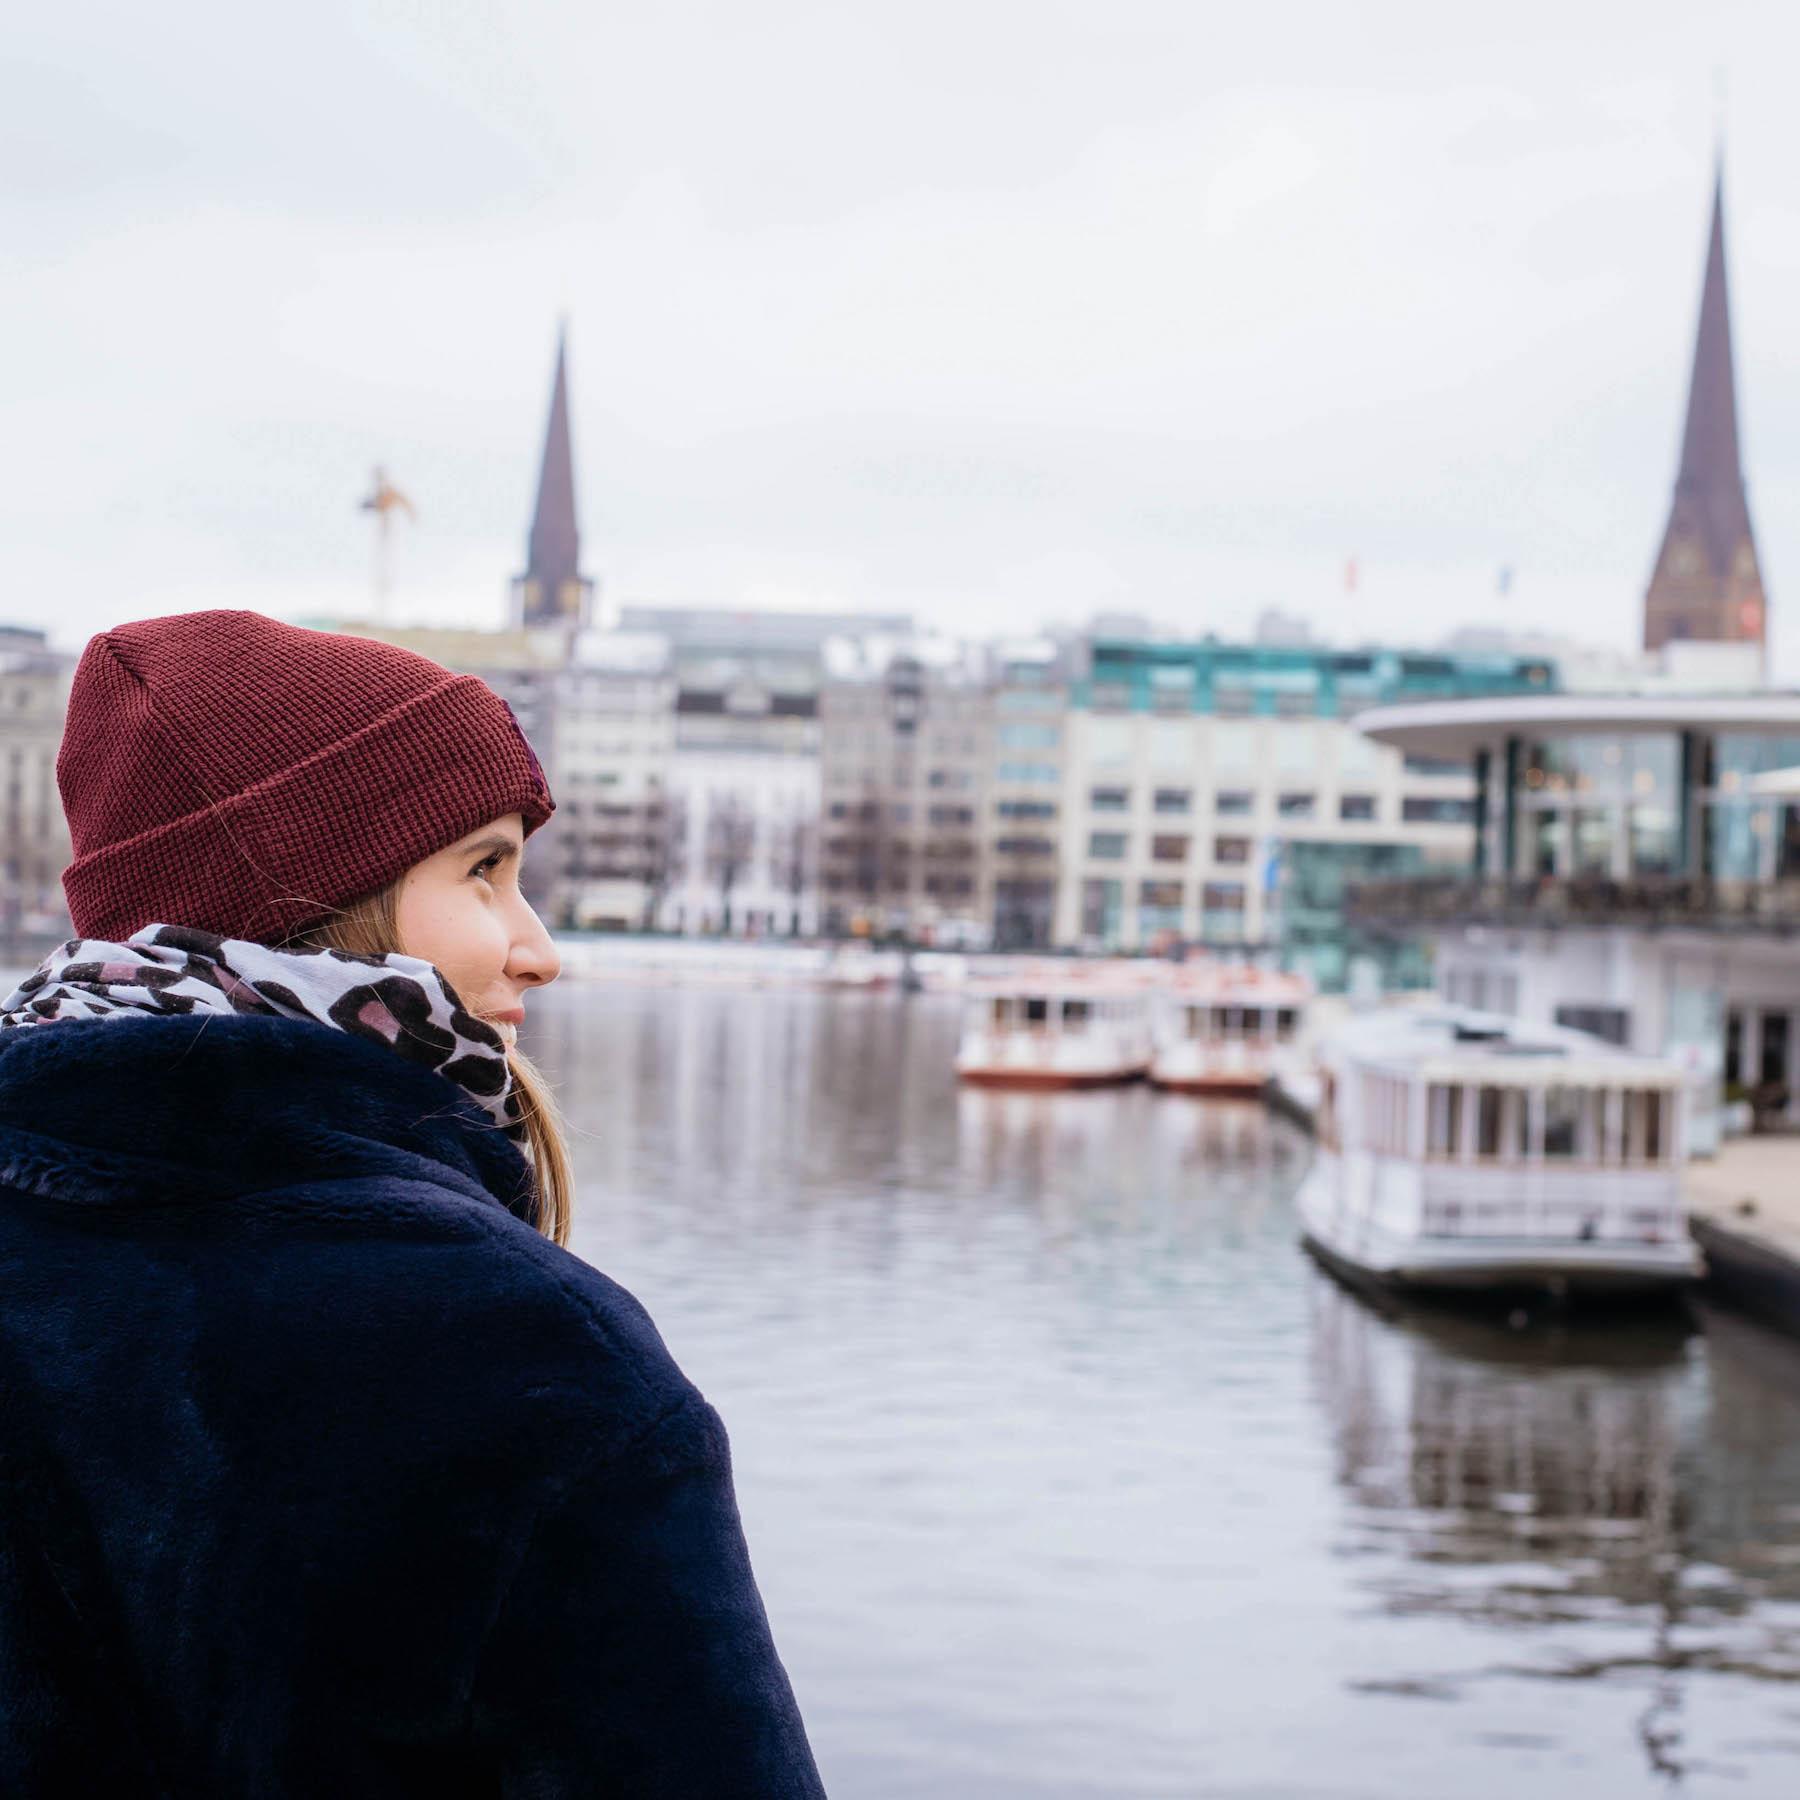 Reiseplanung 2019 suelovesnyc_reiseplanung_2019_hamburg_alster